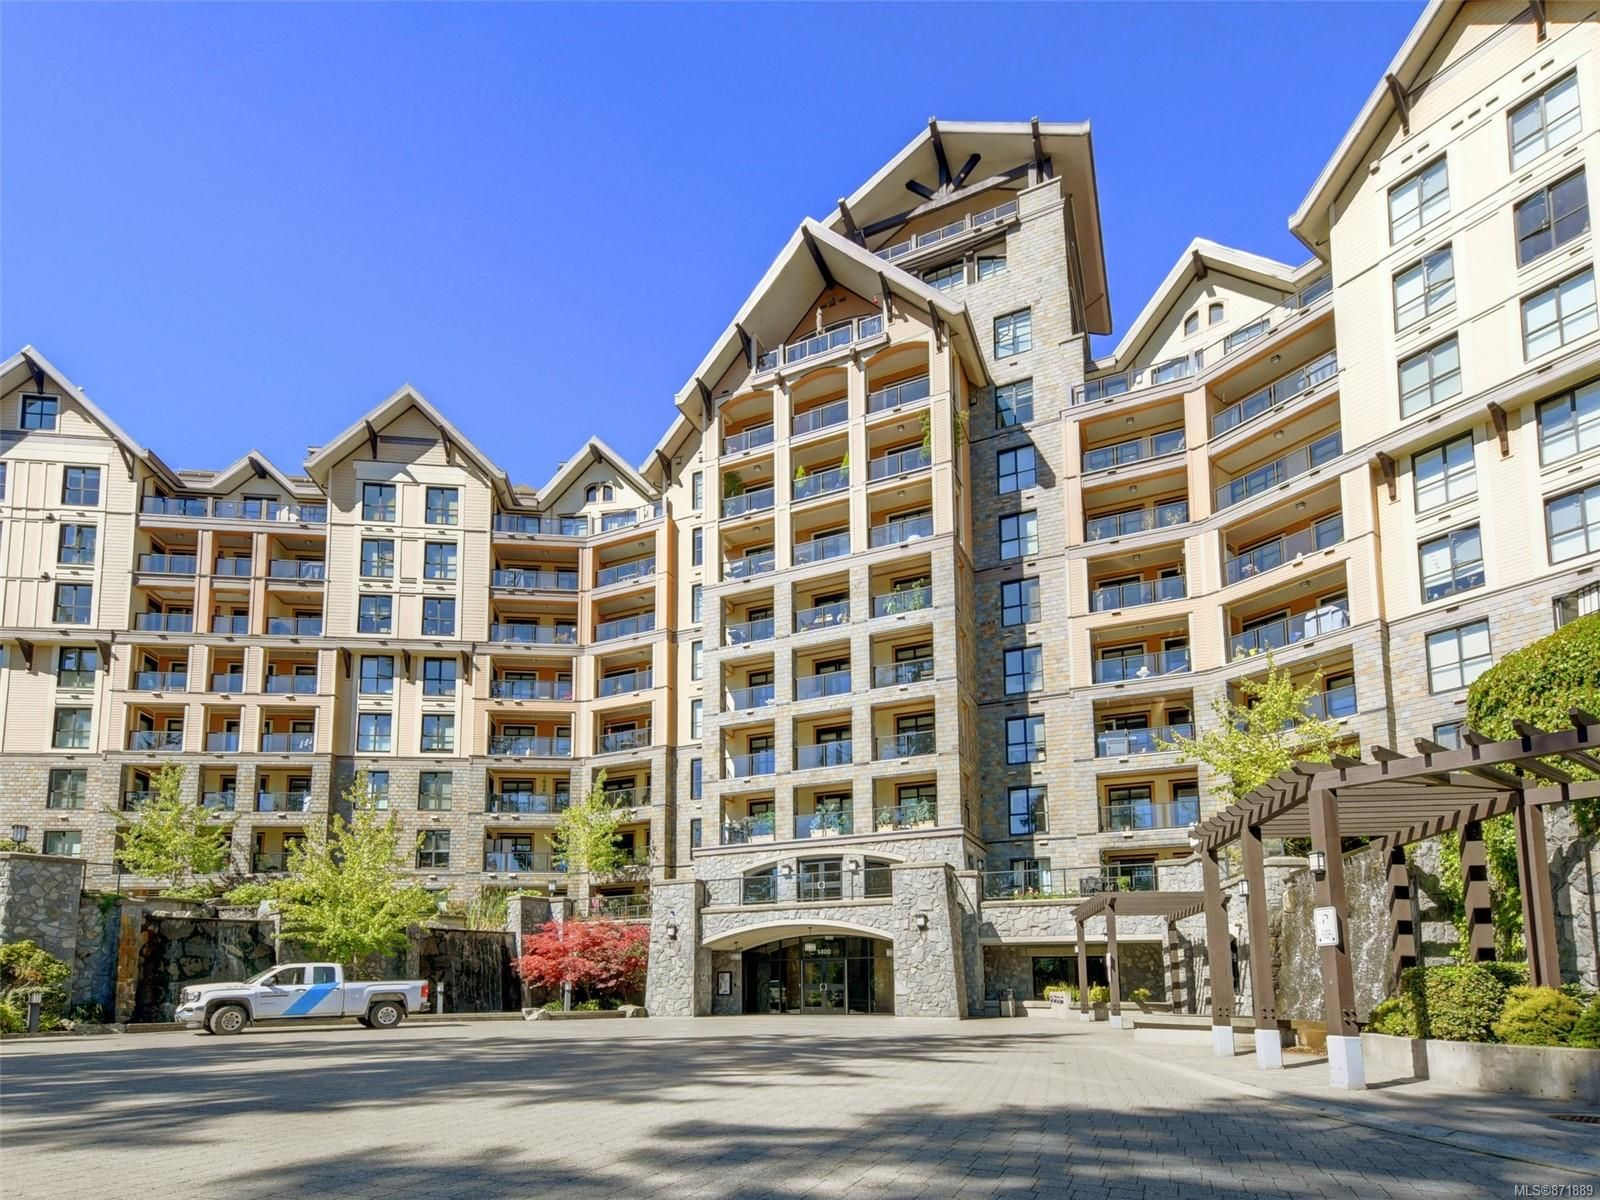 Main Photo: 612 1400 Lynburne Pl in : La Bear Mountain Condo for sale (Langford)  : MLS®# 871889